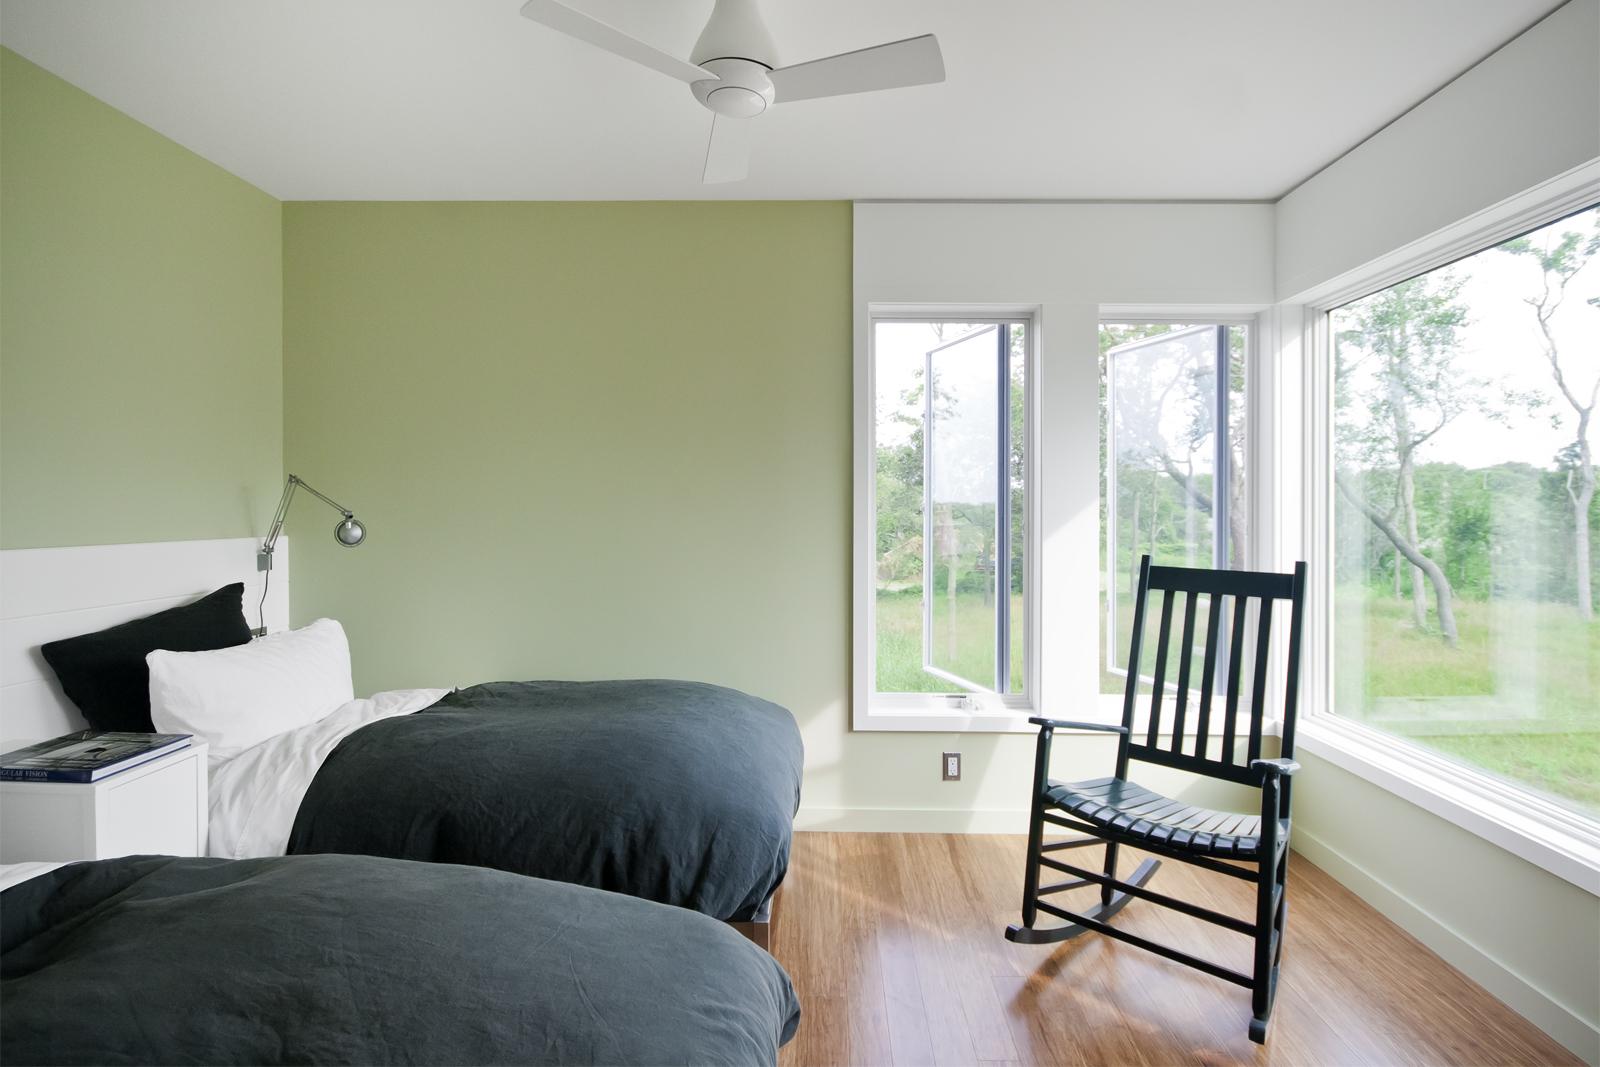 18-res4-resolution-4-architecture-modern-modular-home-prefab-house-fishers-island-interior-bedroom.jpg